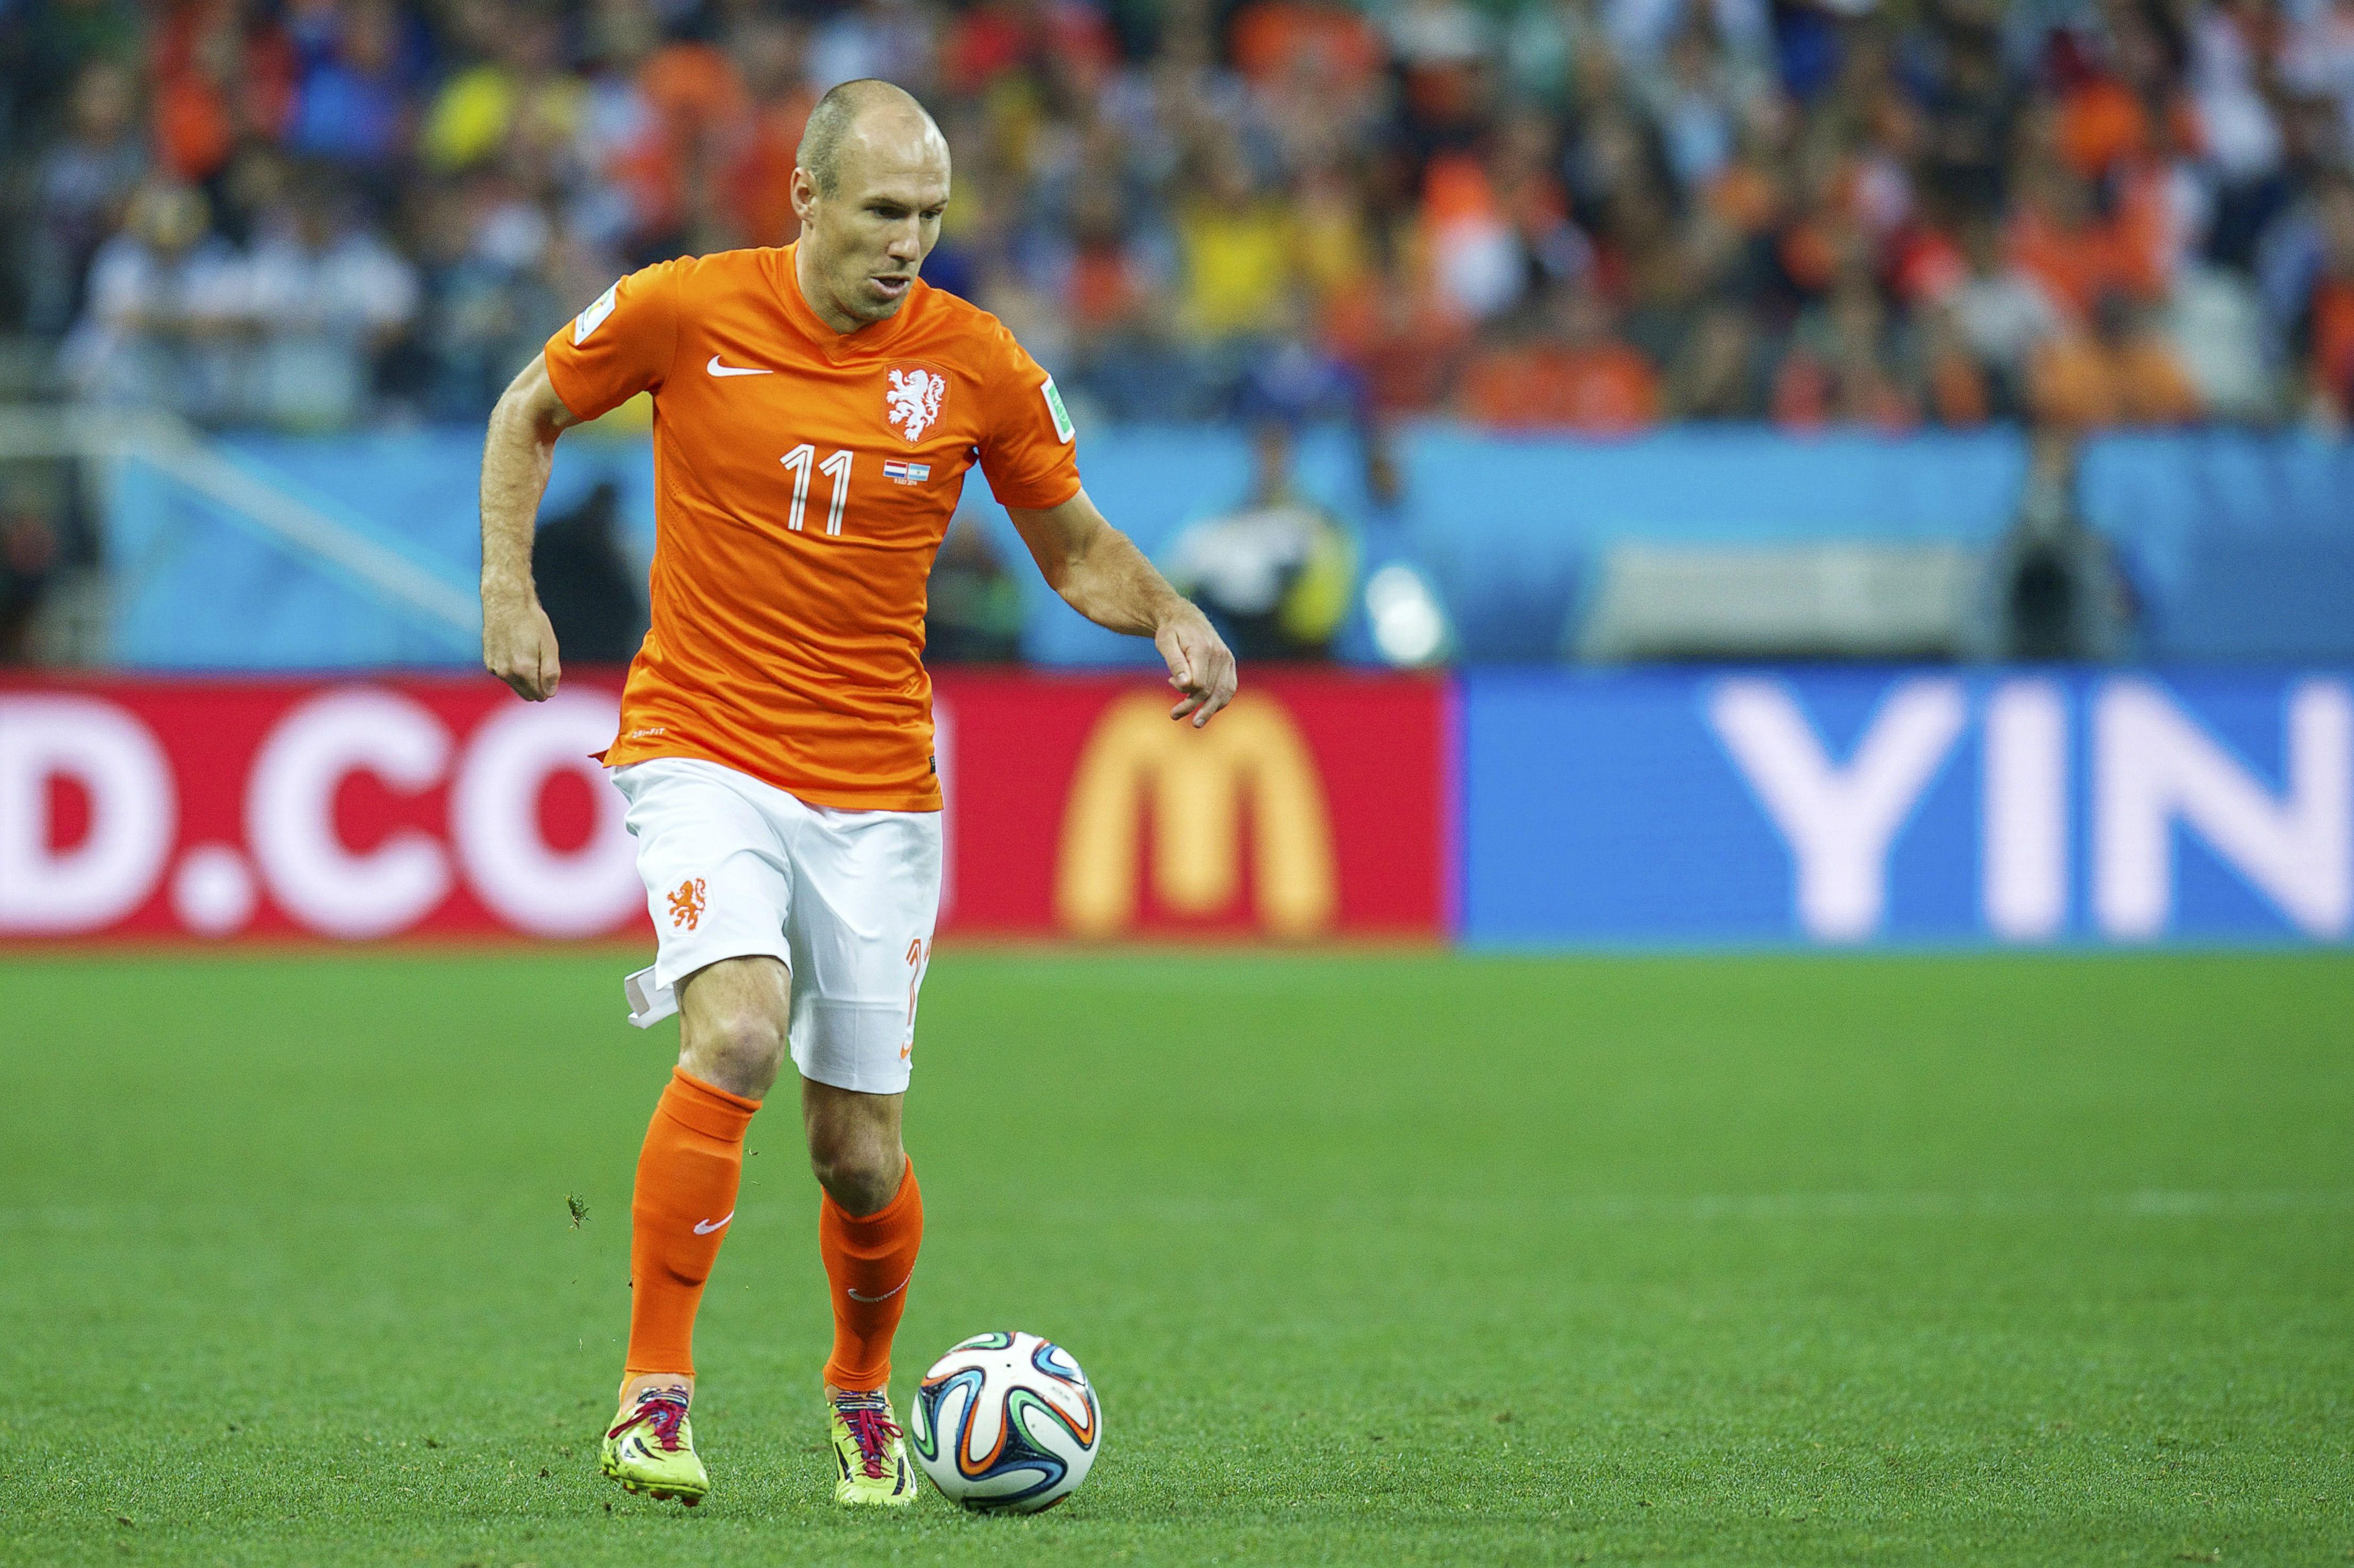 Arjen Robben faces Argentina